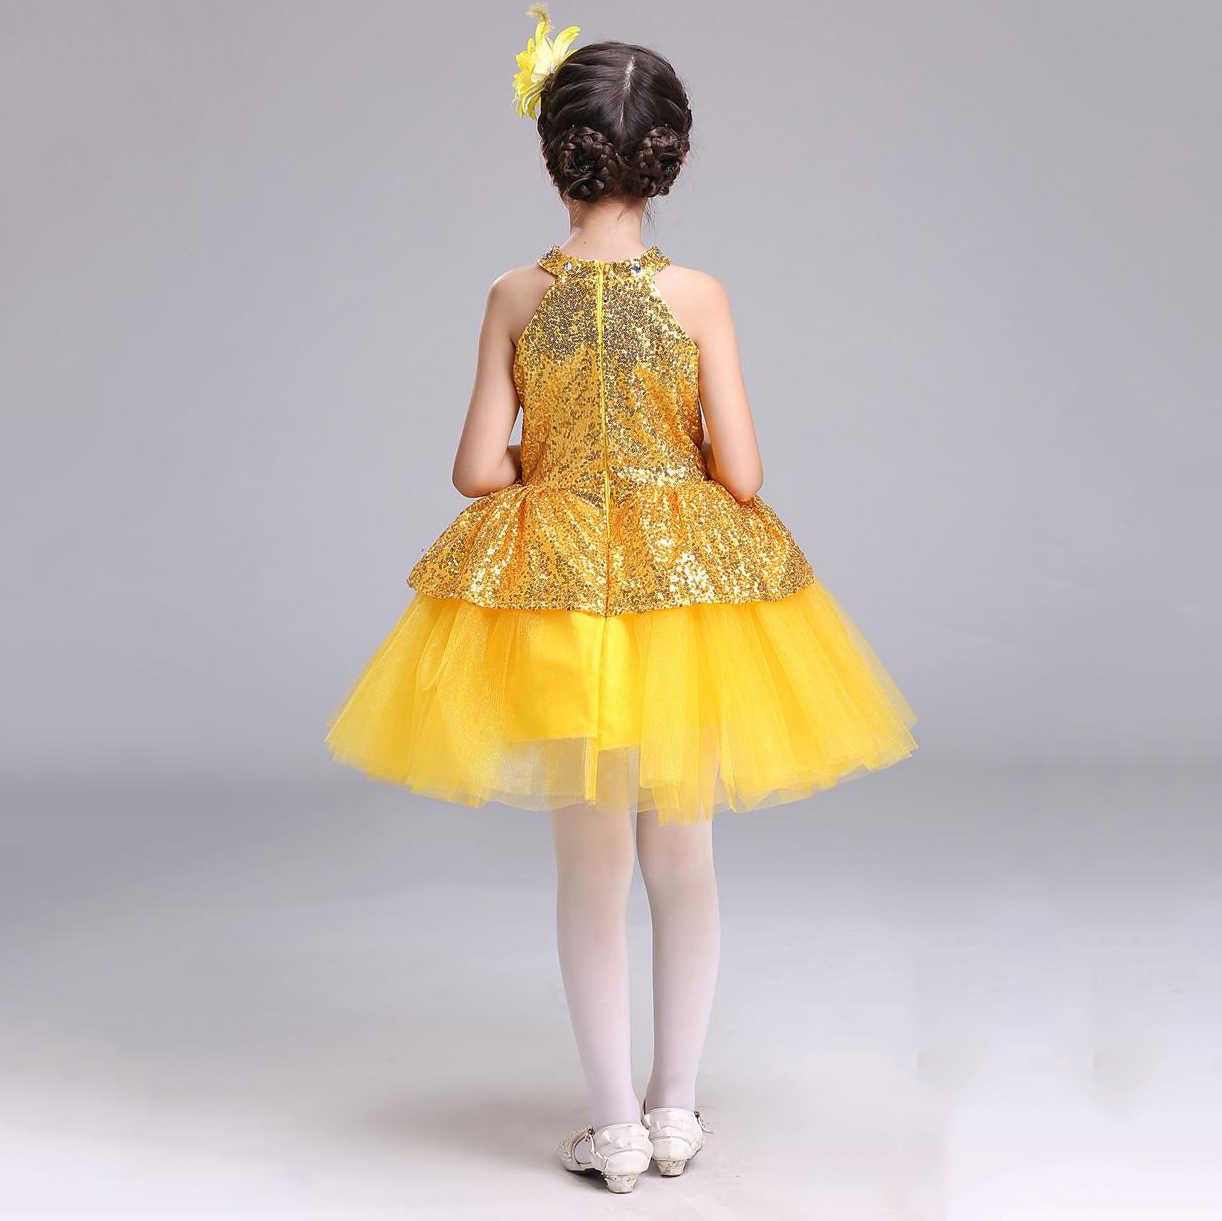 c0813acc59045 ... Children Summer Clothing Girls Bling Bling Sequins Top Graduation Party  Jazz Dance Dress Girls Kids 2 ...